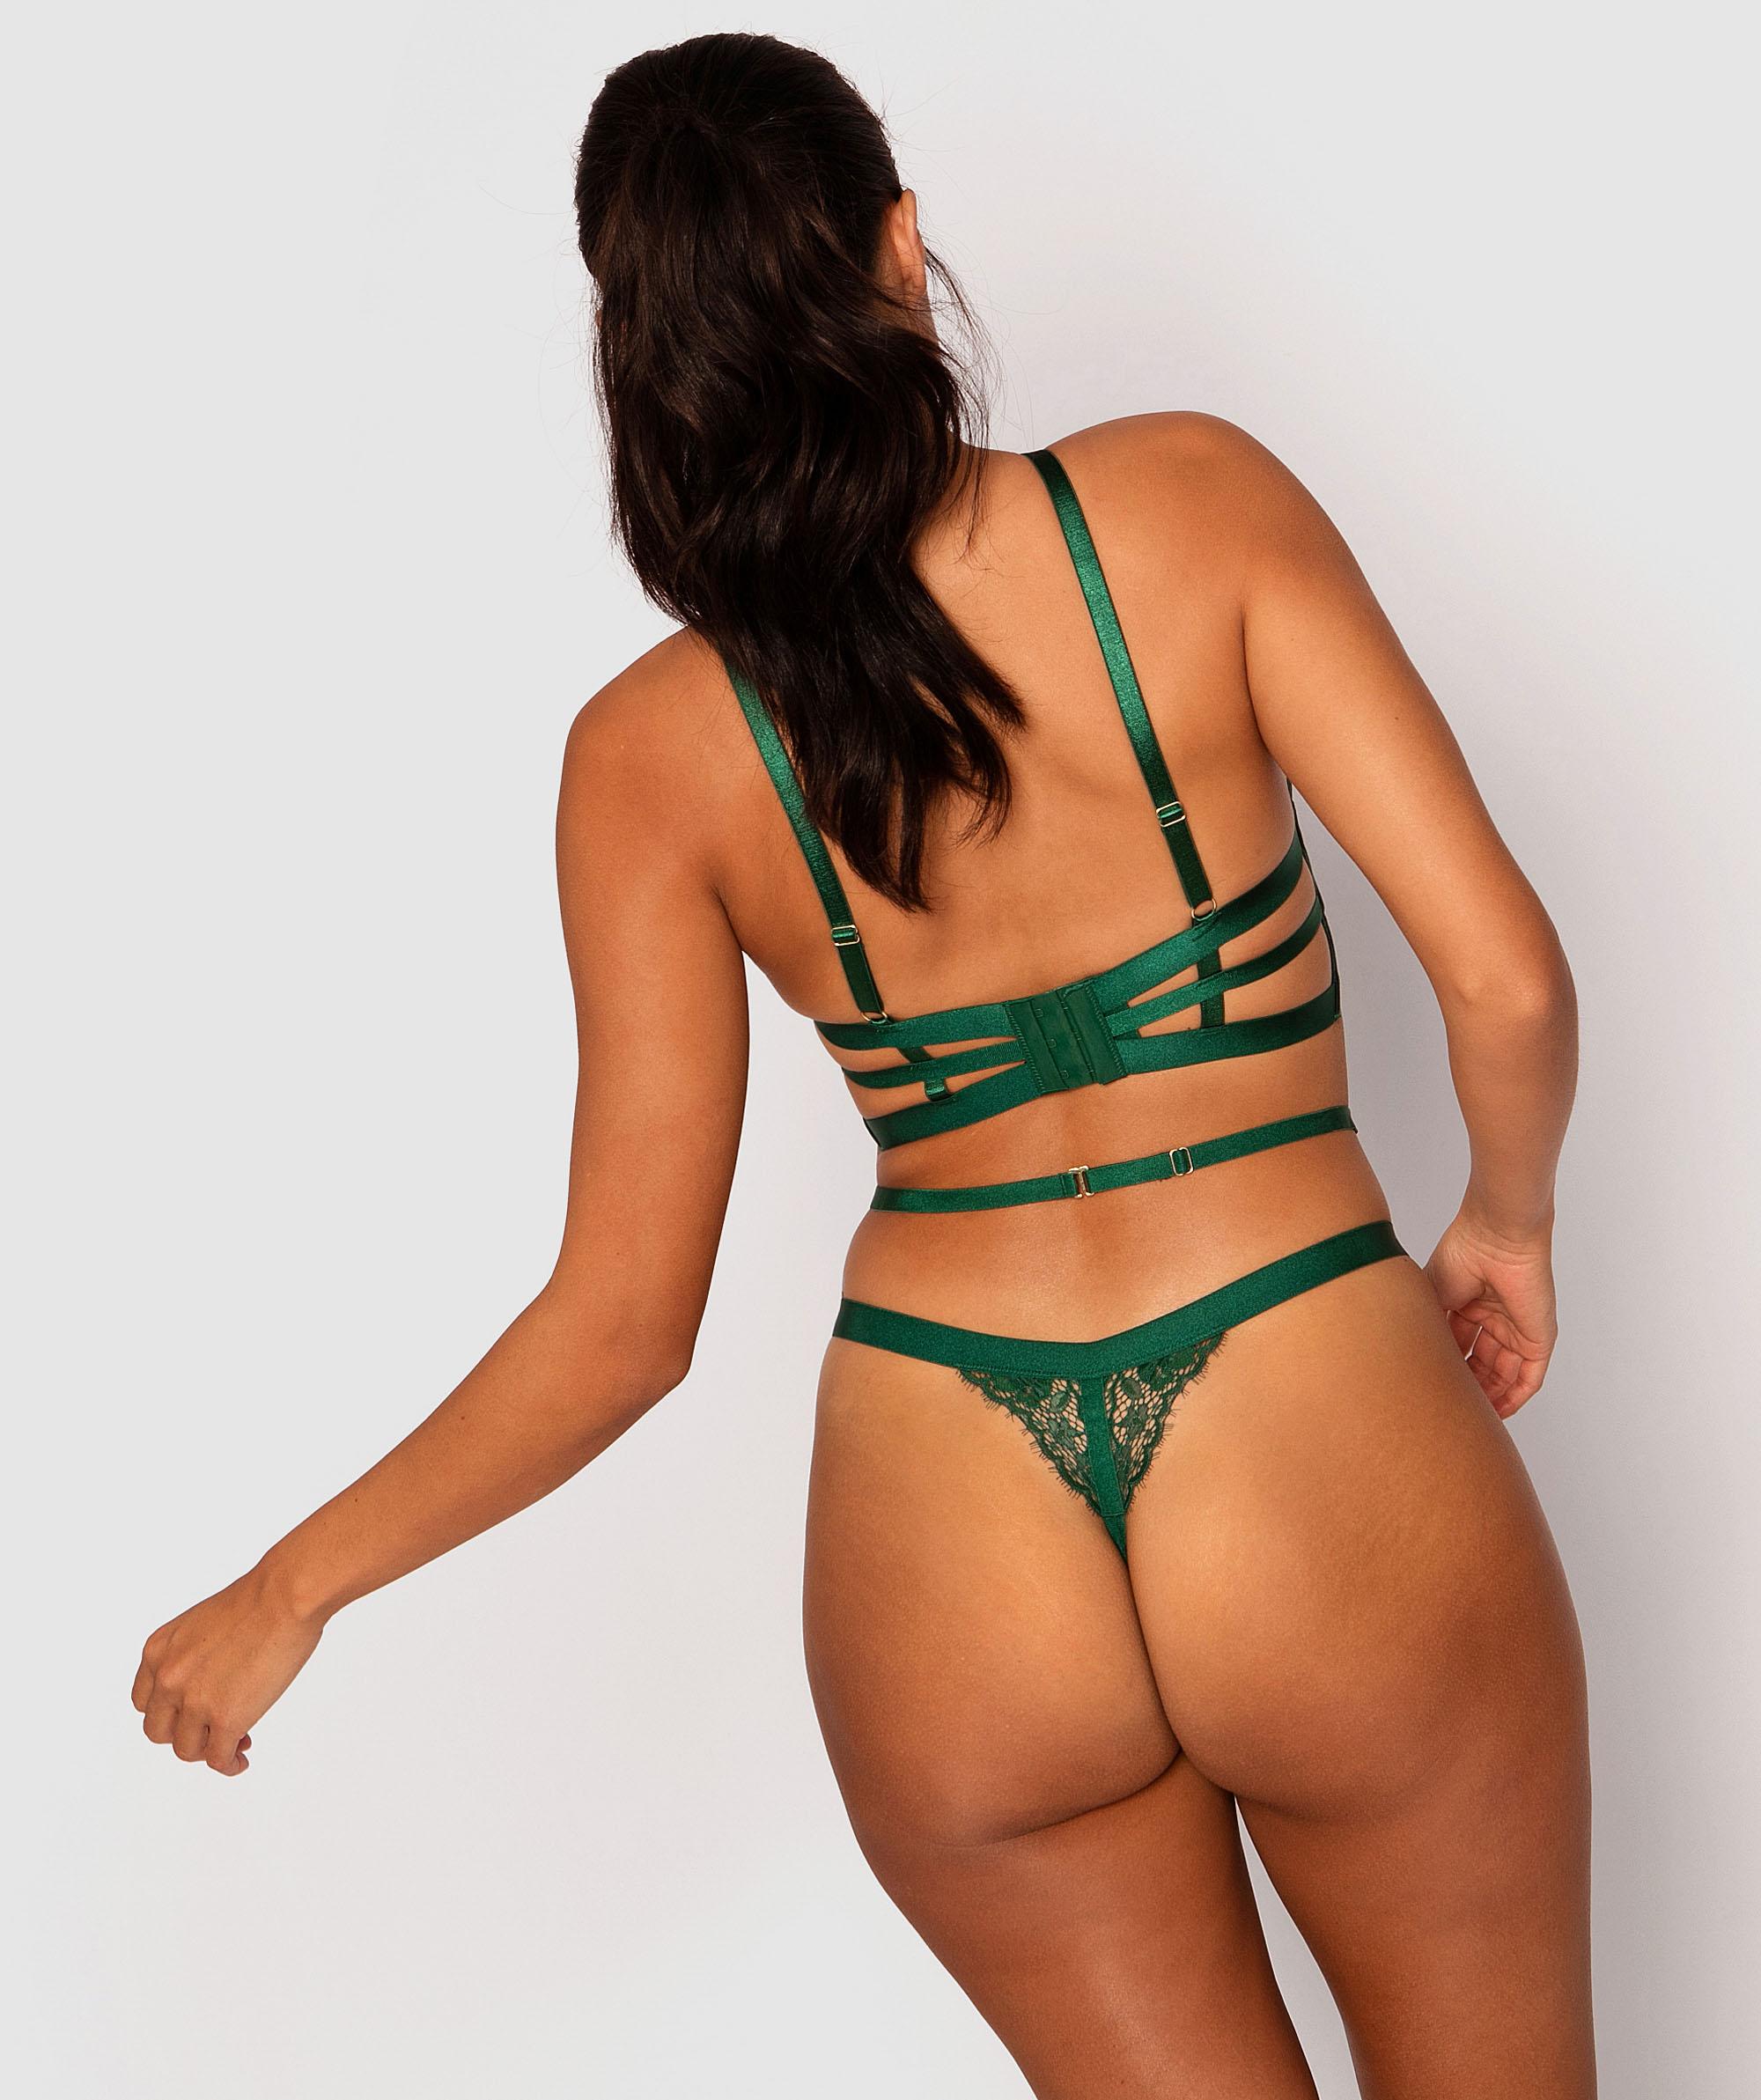 Shiloh Mini V Knicker - Dark Green